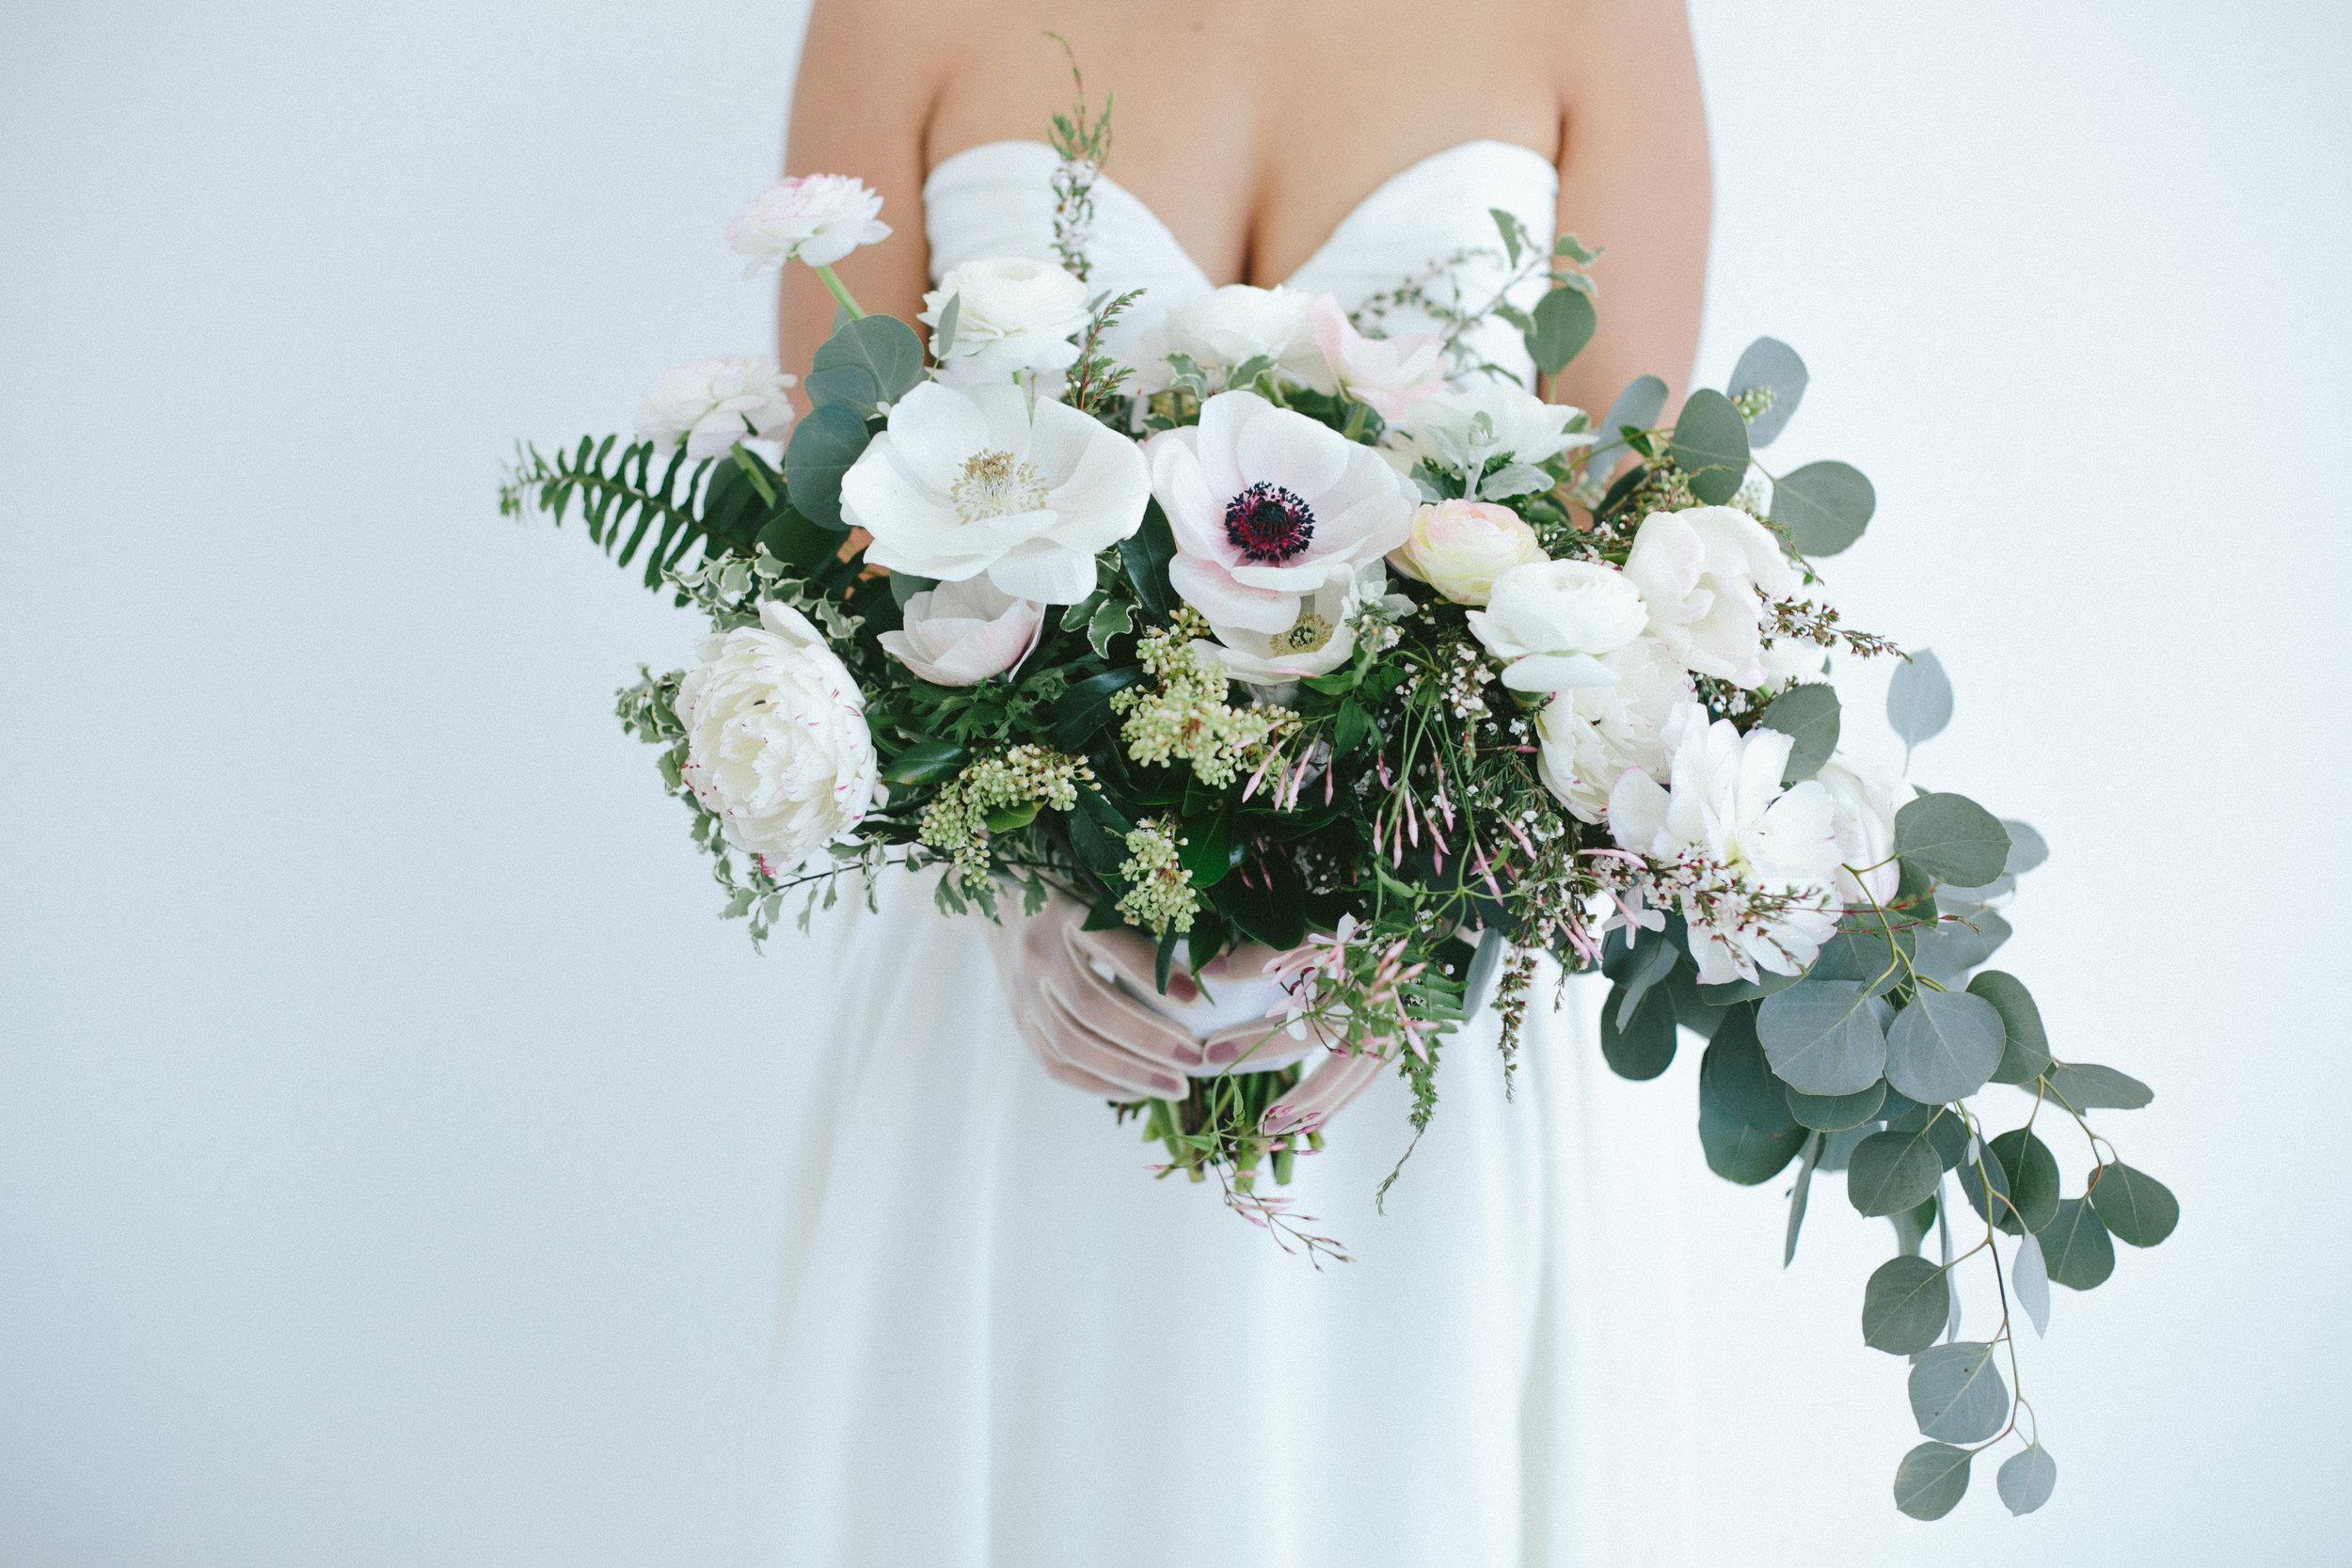 Frances + Bucky // Photographer: Linda Abbott, Floral Designer:  Revel Petals